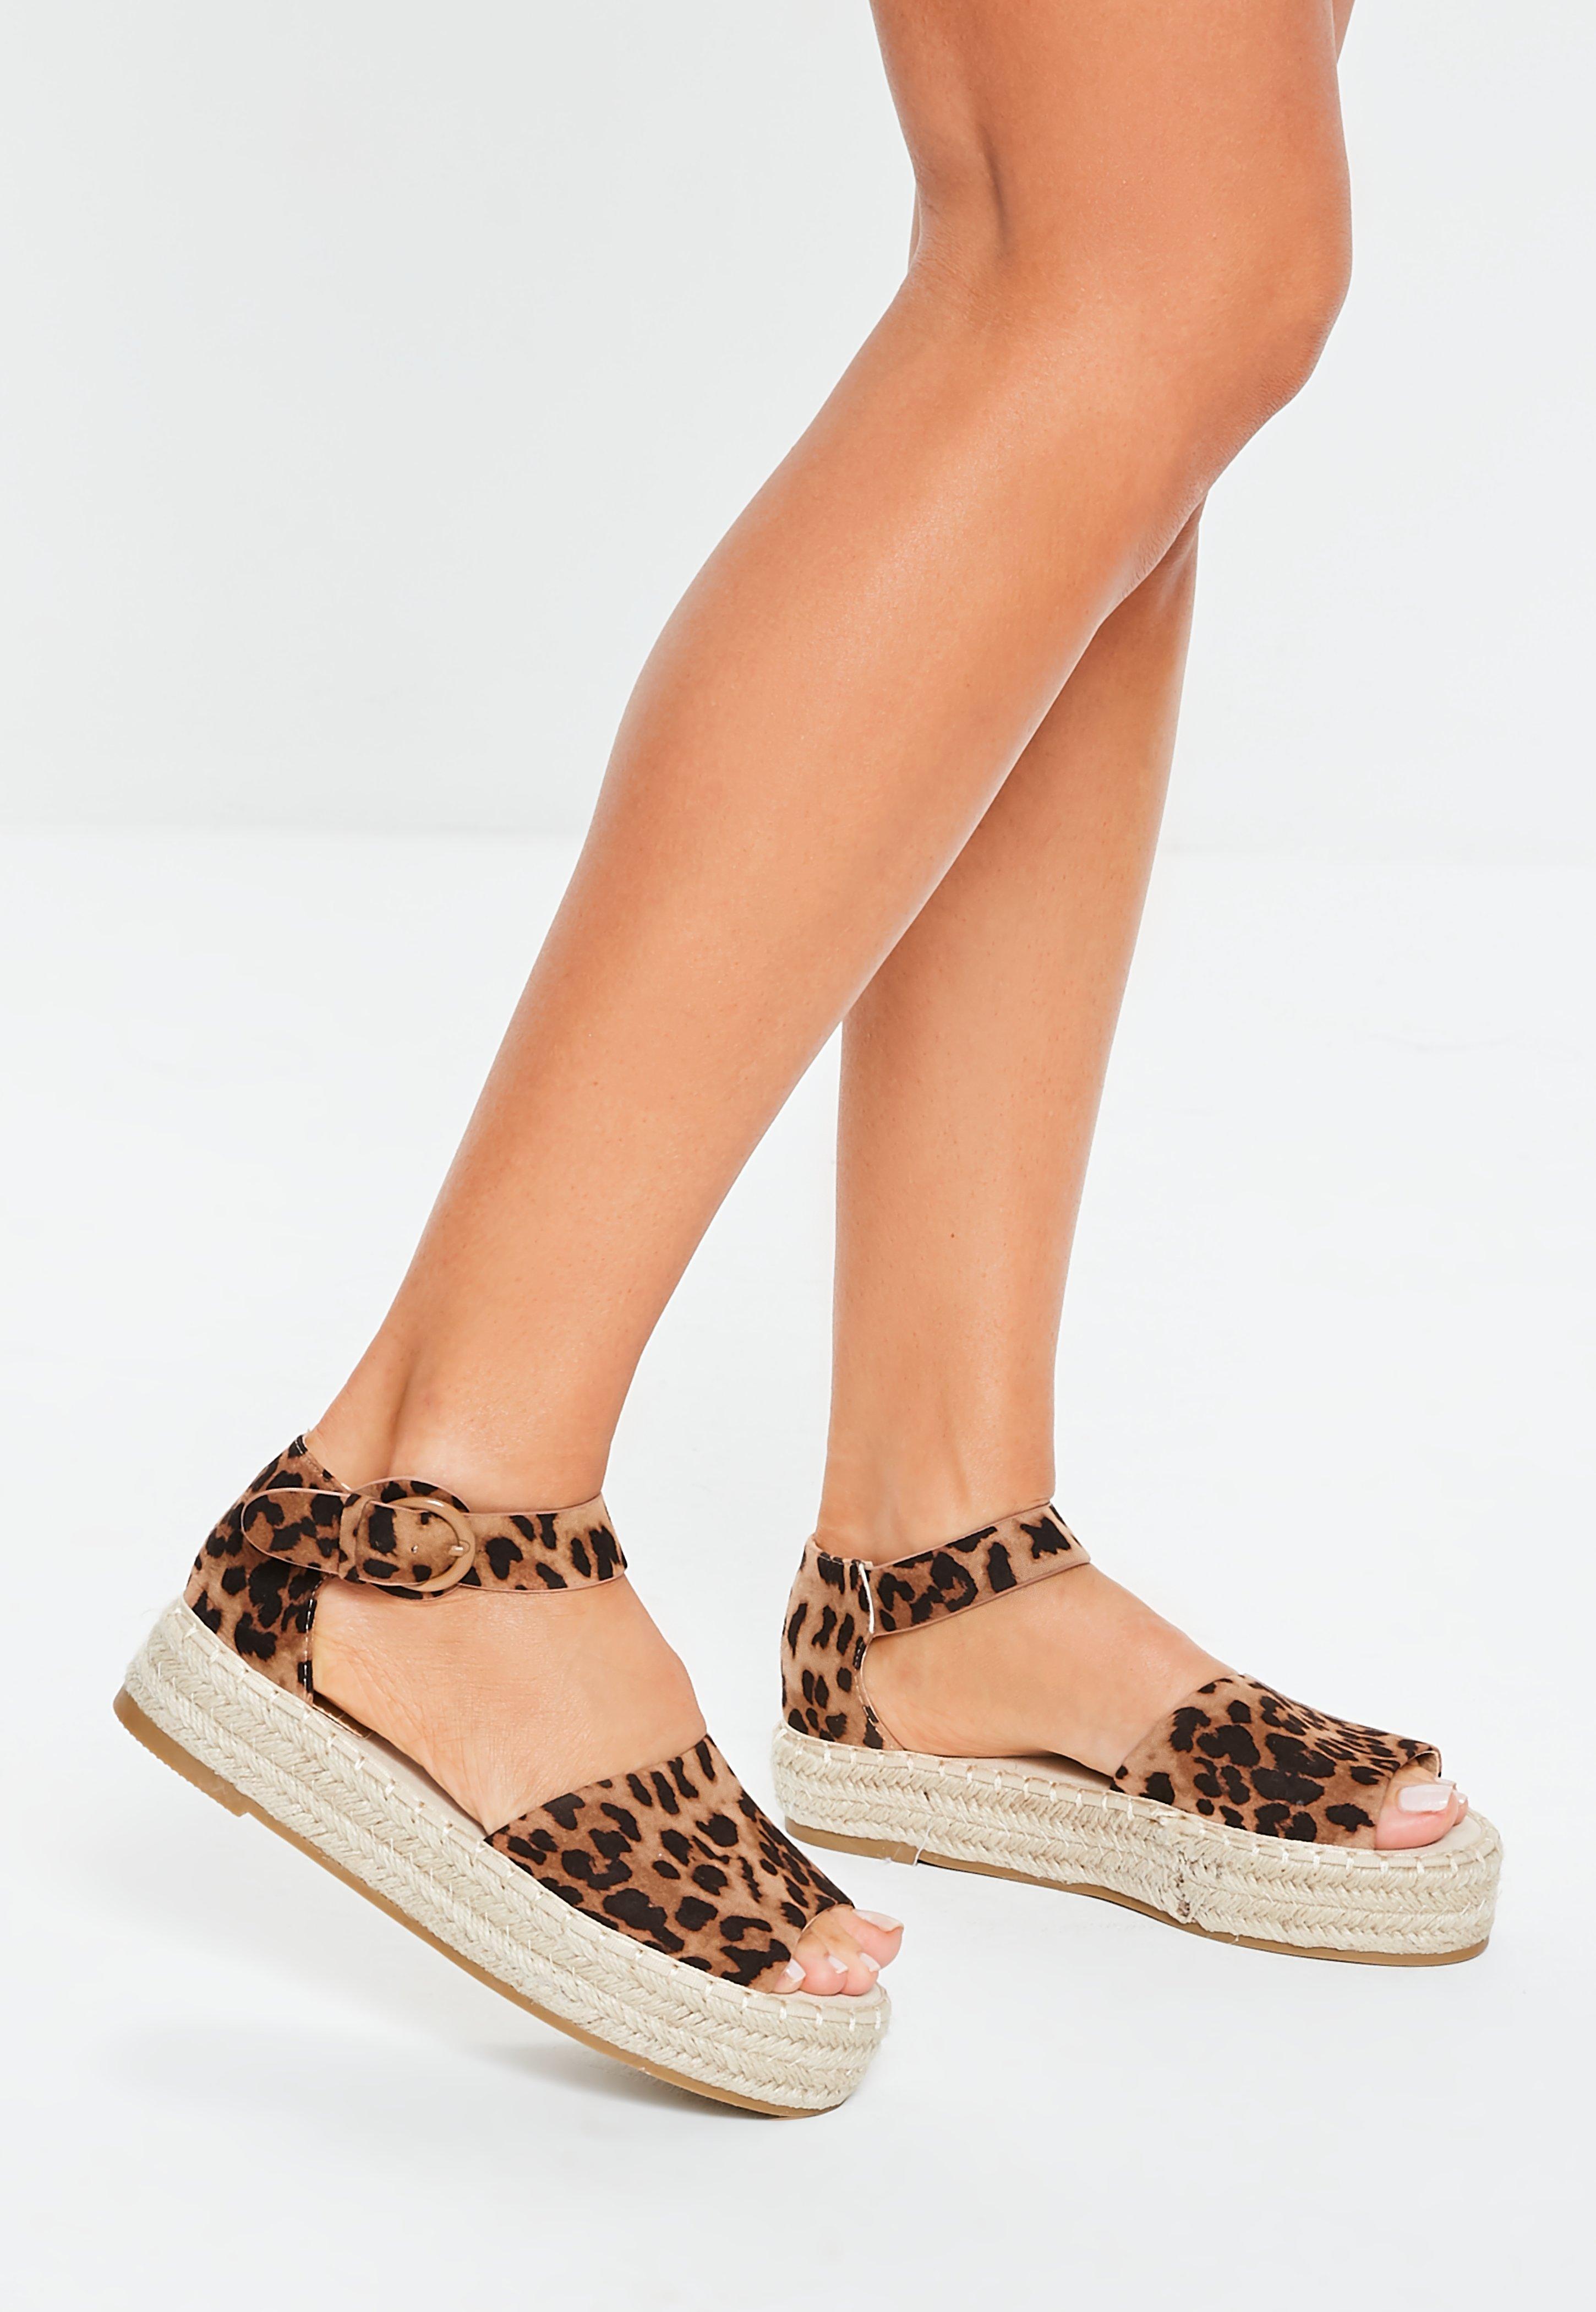 a906b9fb722 Women s Flat Sandals   Espadrilles - Missguided